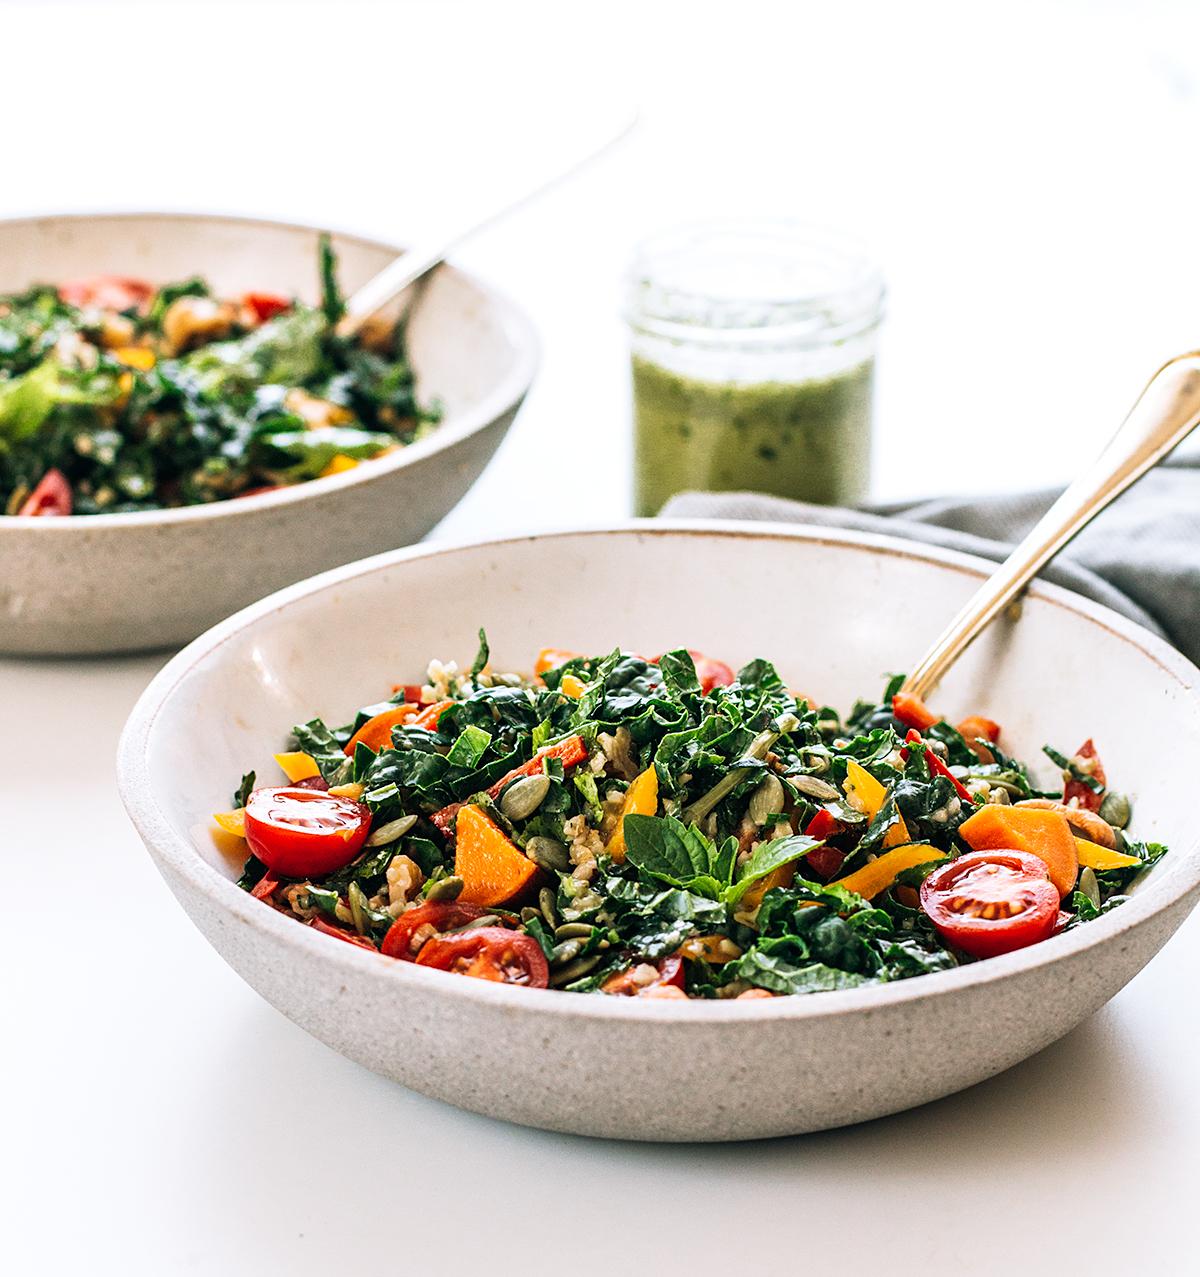 Freekeh Salad with Kale, Sweet Potato and Homemade Lime Cilantro Dressing.jpg